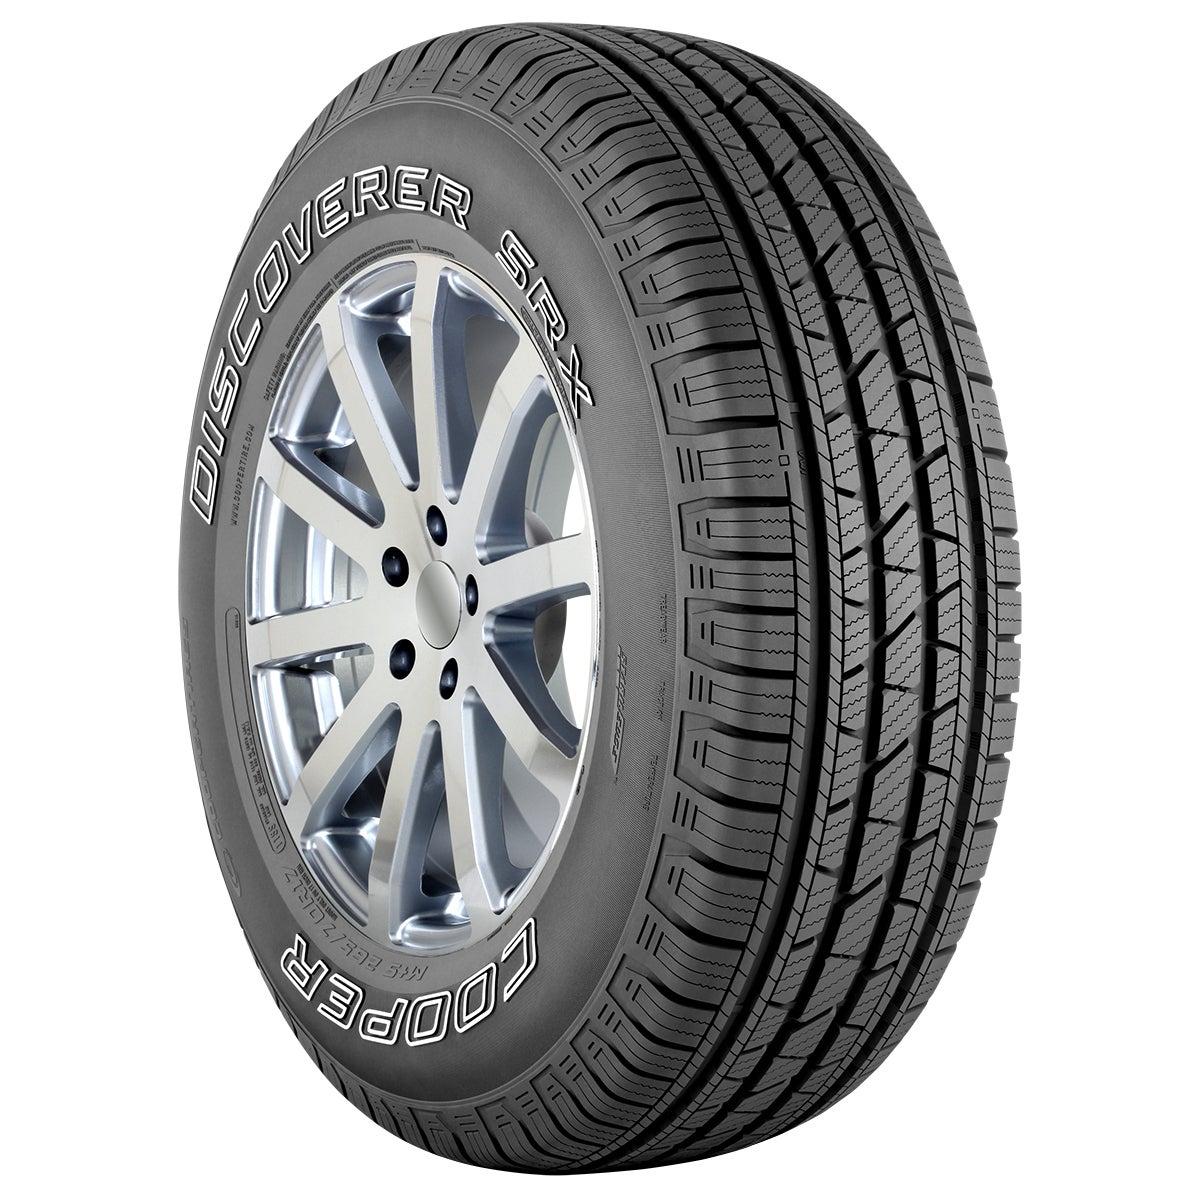 COOPER Discoverer SRX All Season Tire - 265/70R16 112T (B...